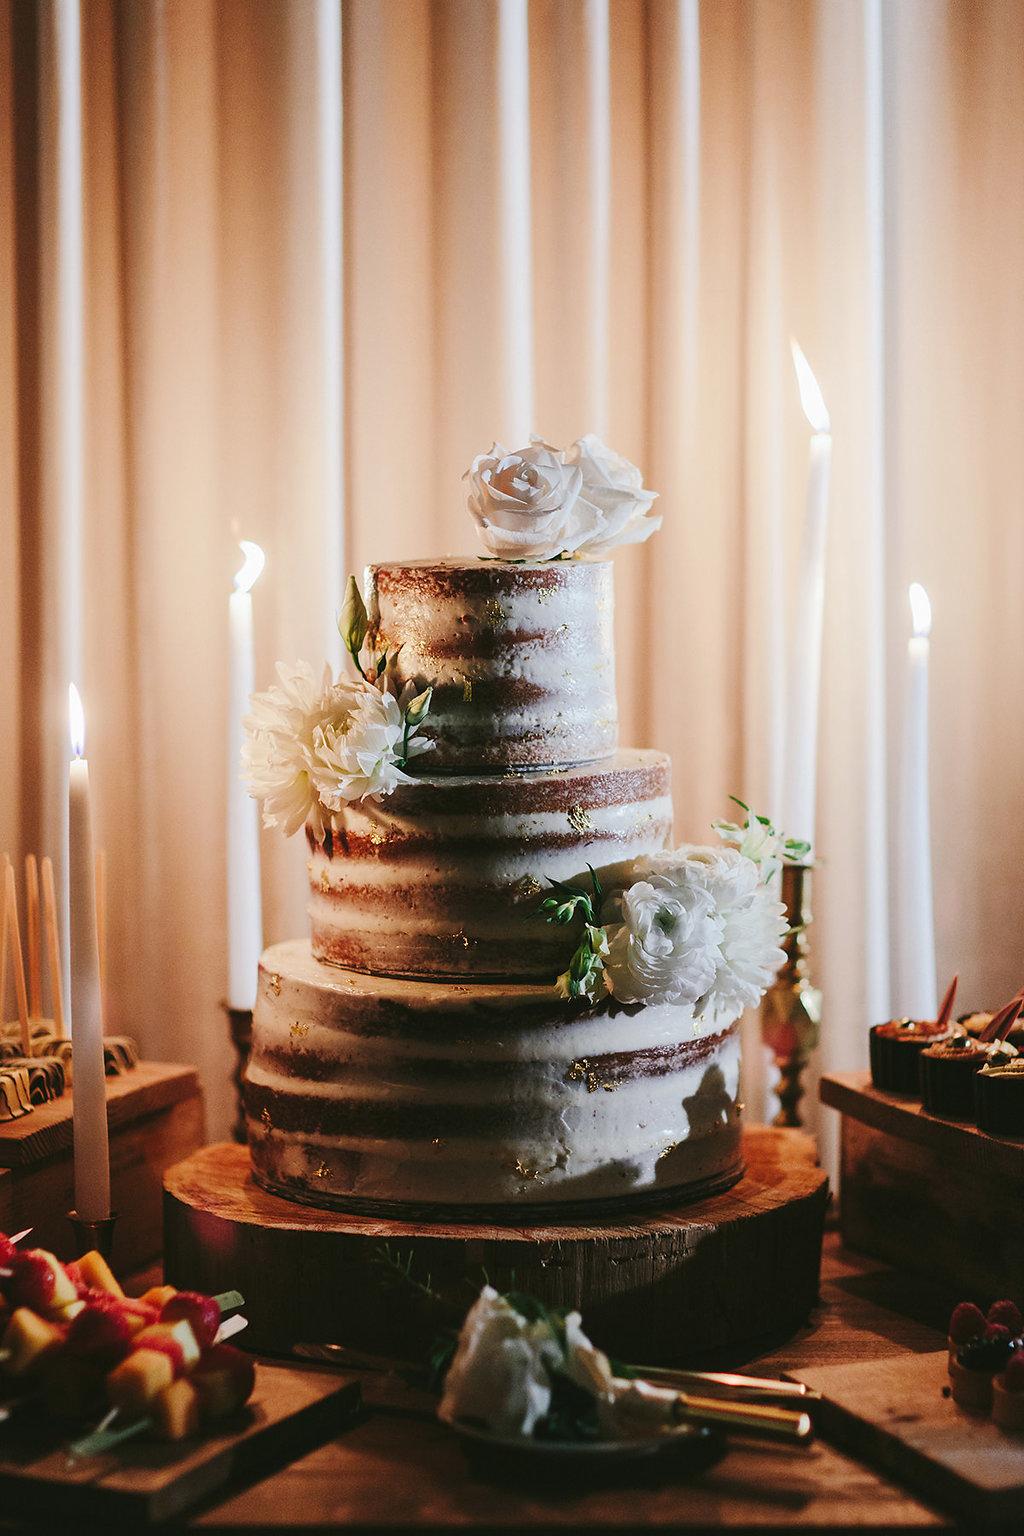 wedding cakes - photo by Melia Lucida http://ruffledblog.com/elegant-canadian-wedding-with-greenery